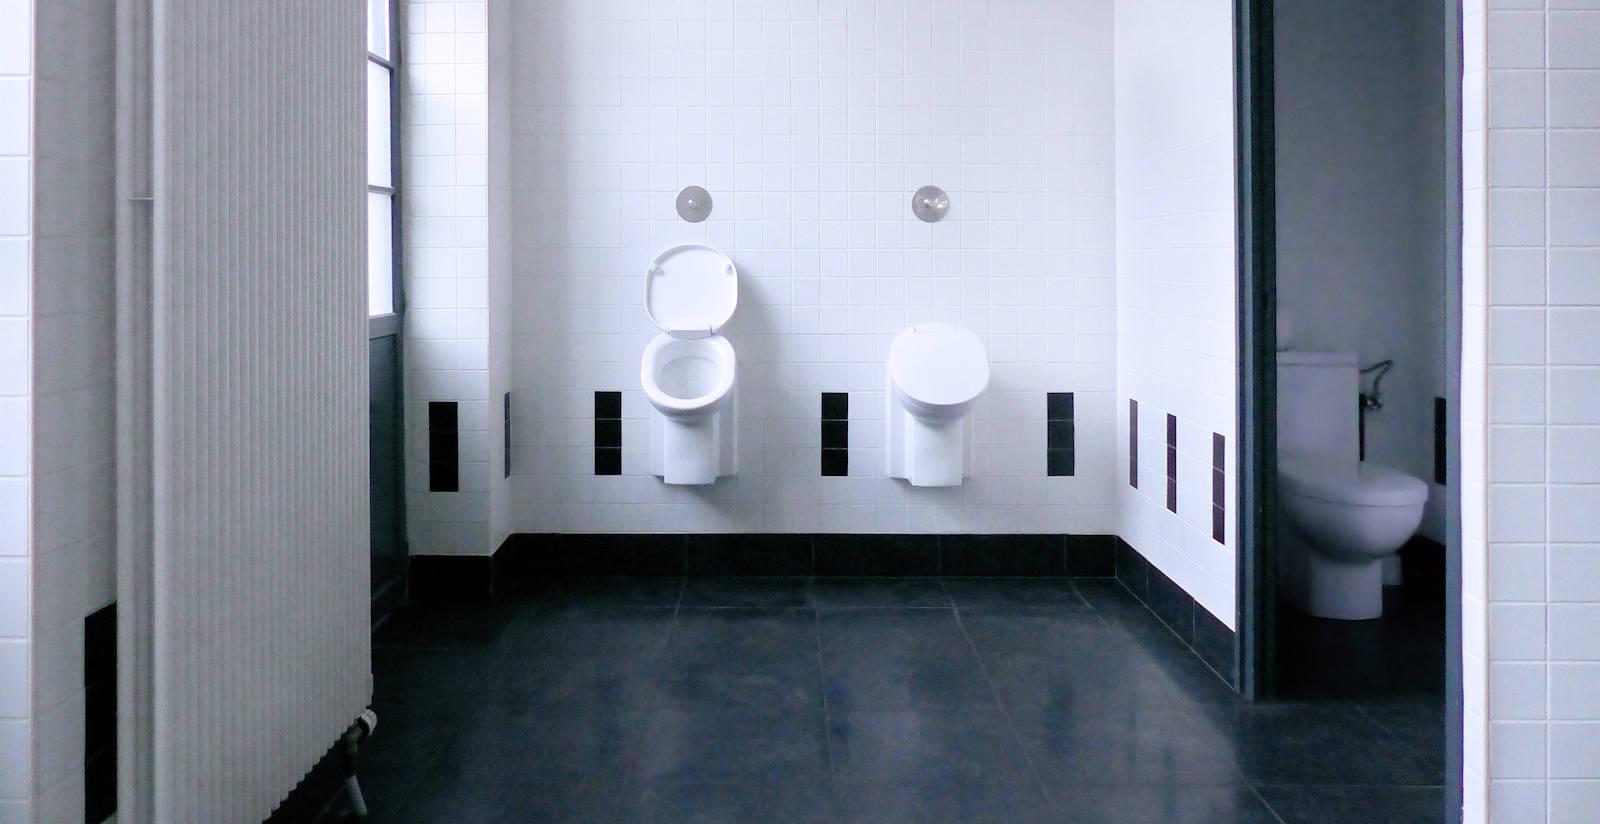 Urinoirs des toilettes Hommes